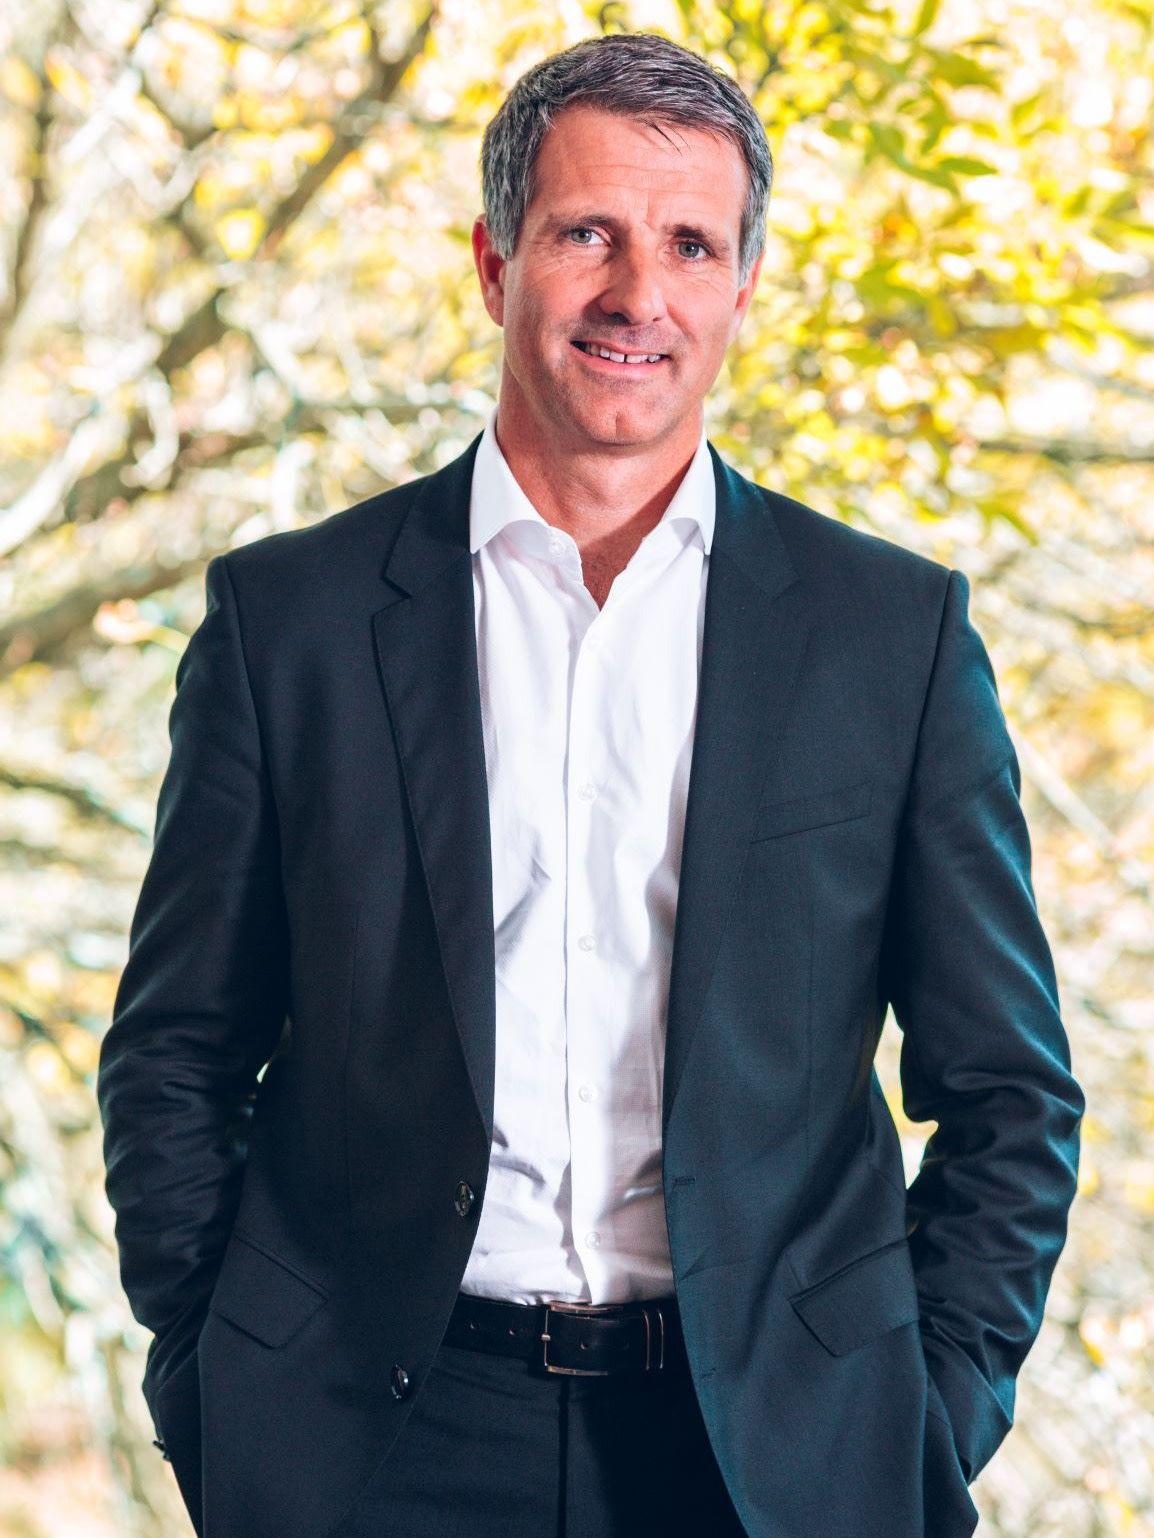 Hallura adds Paul Navarre to its Board of Directors, HALLURA